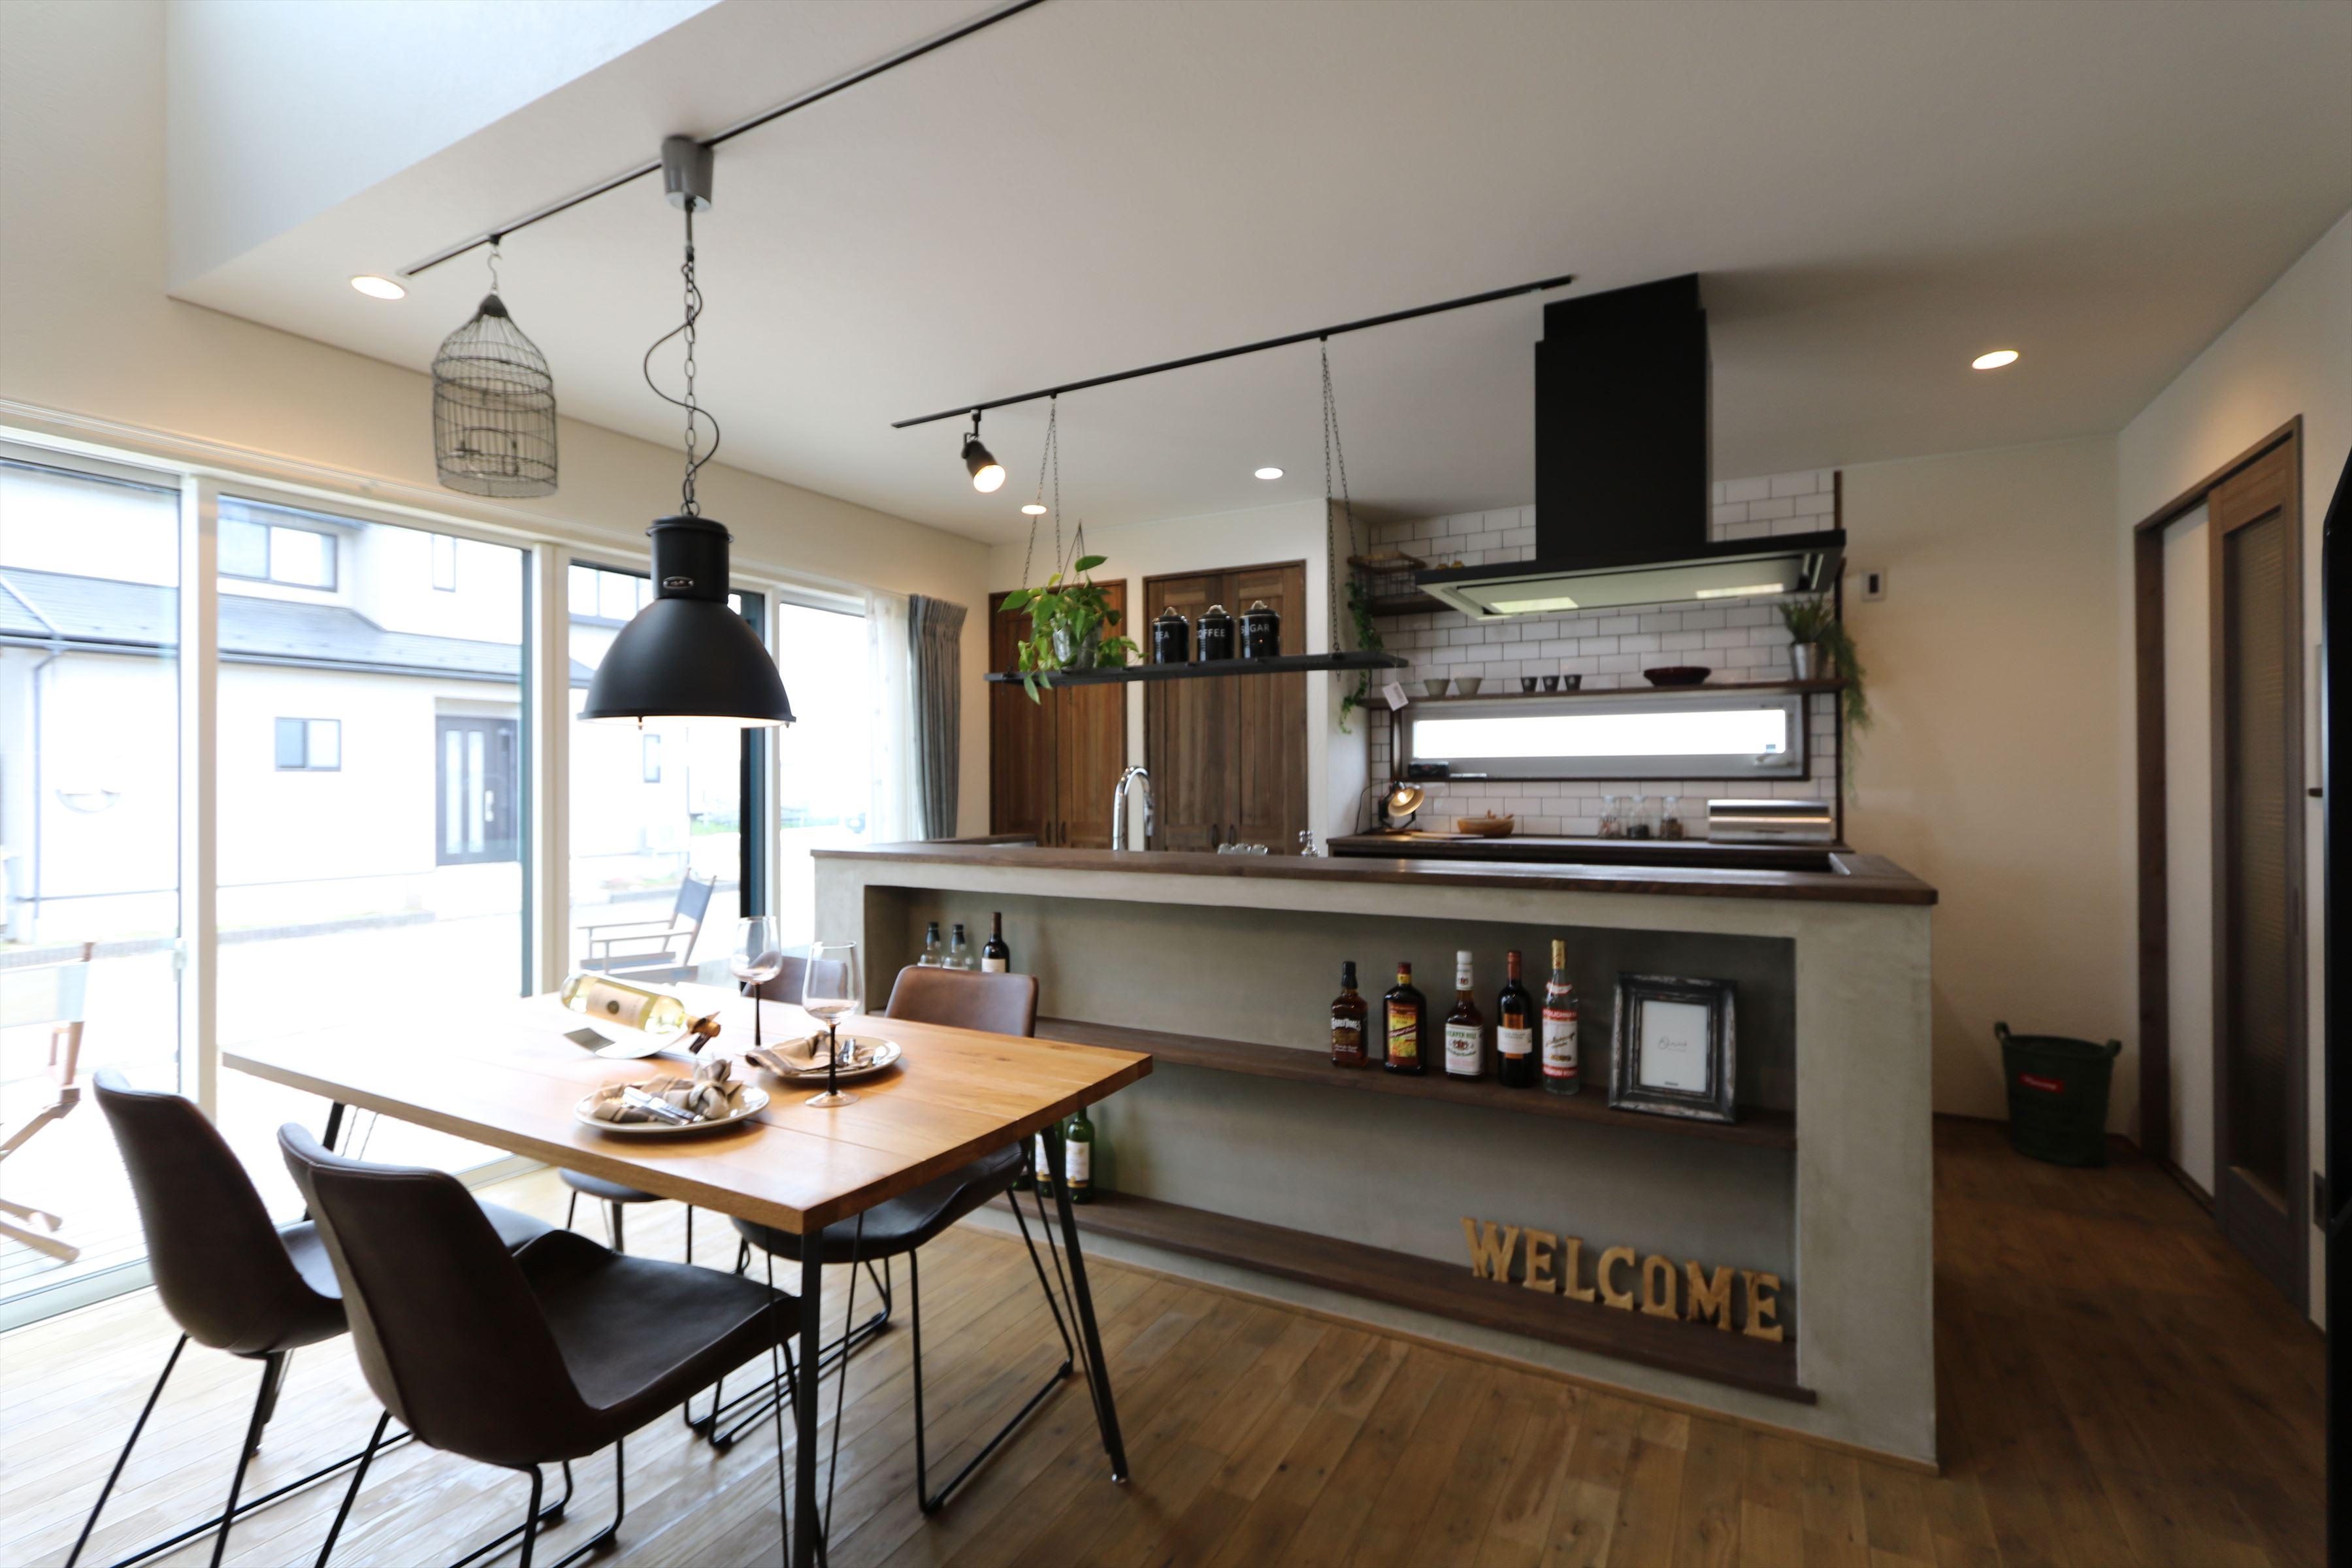 Industrial Modern|石川県金沢市の注文住宅・デザイン性・新築の家・戸建て|E-HOUSE